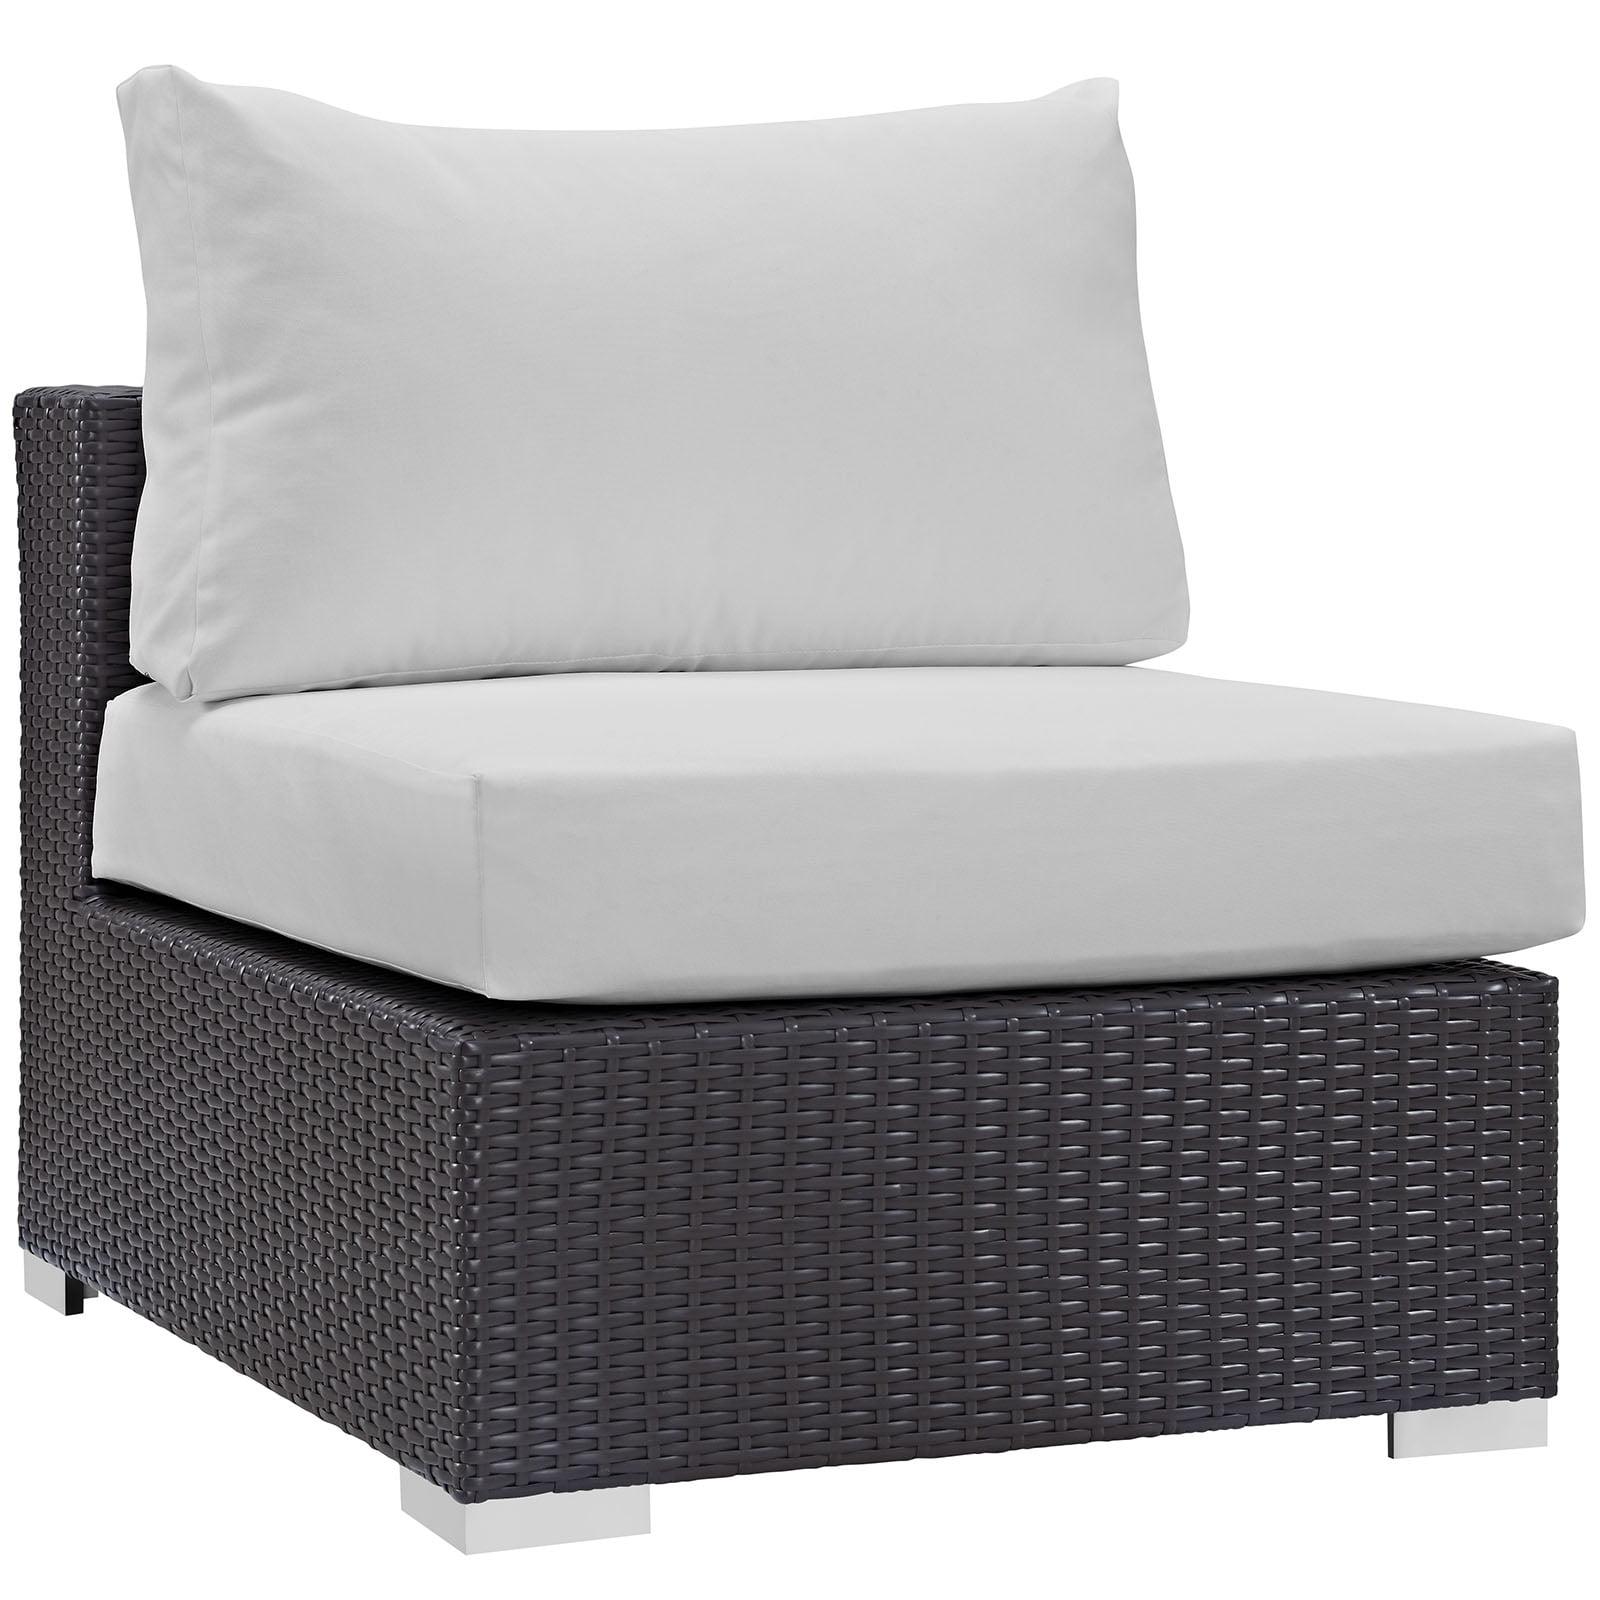 Modern Contemporary Urban Design Outdoor Patio Balcony Lounge Chair, White, Rattan